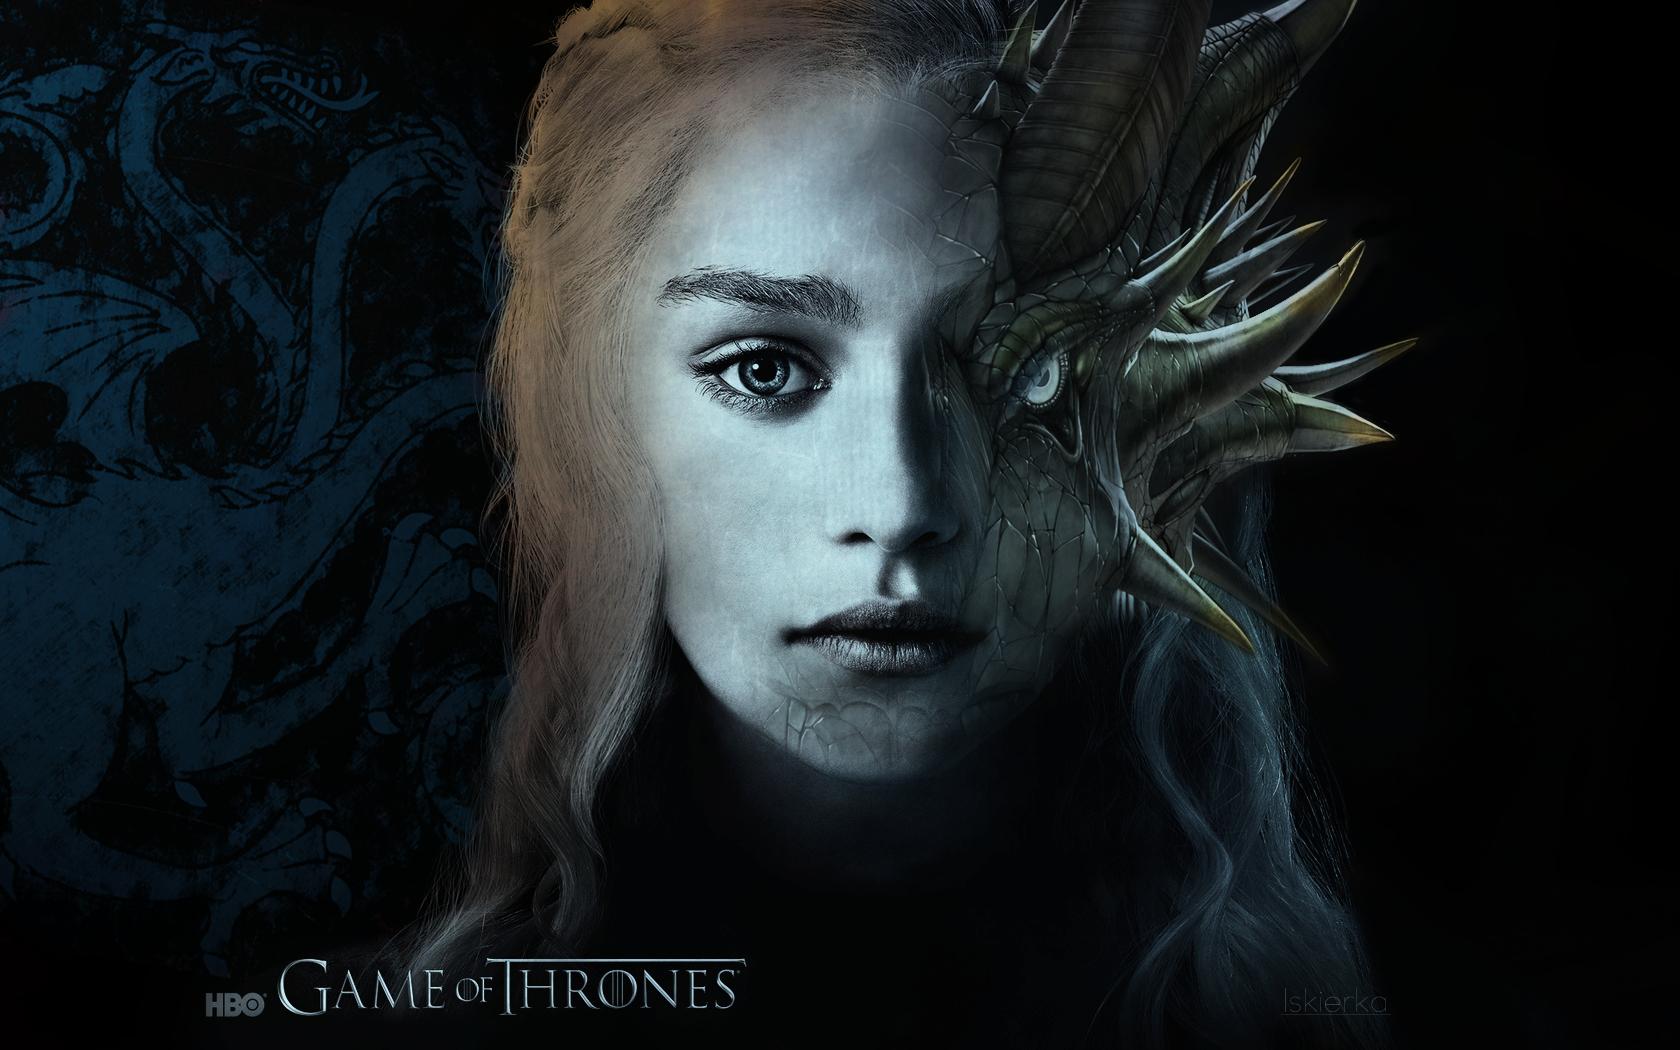 Daenerys Targaryen Game Of Thrones Wallpaper By Iskierka0 On